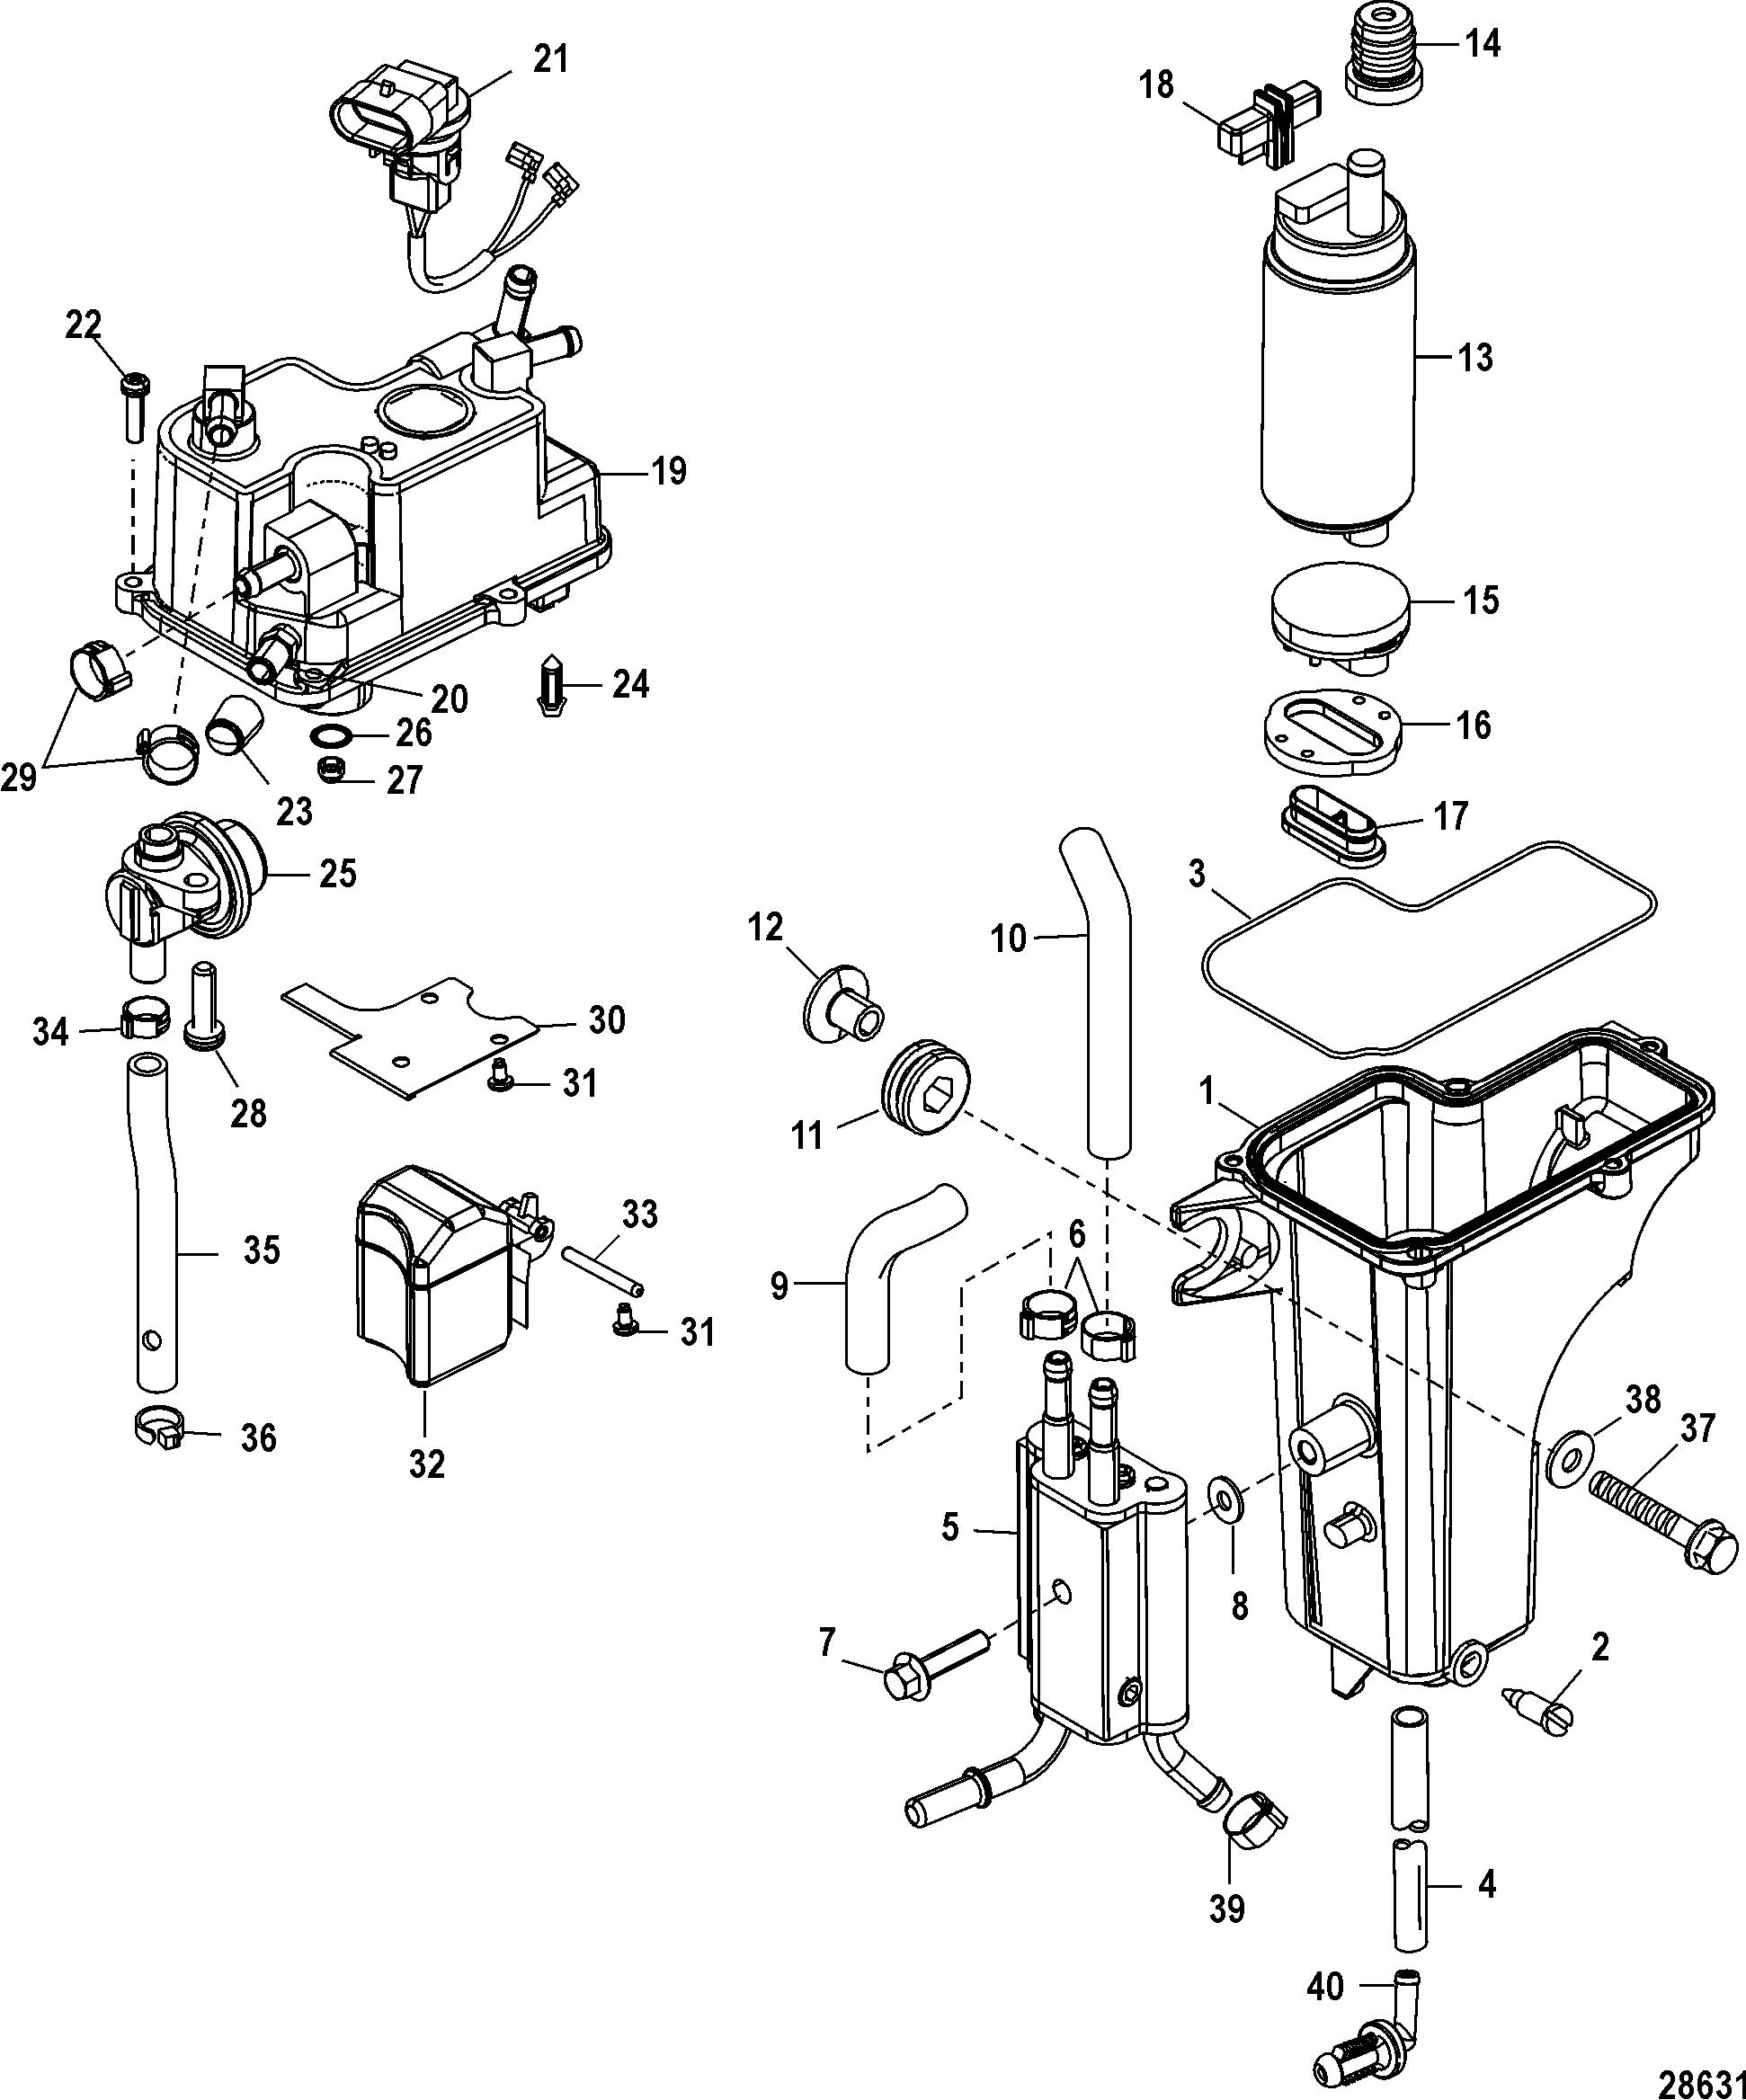 Mercury mariner 50 efi 4 cyl 4 stroke 0p515897 up vapor separator